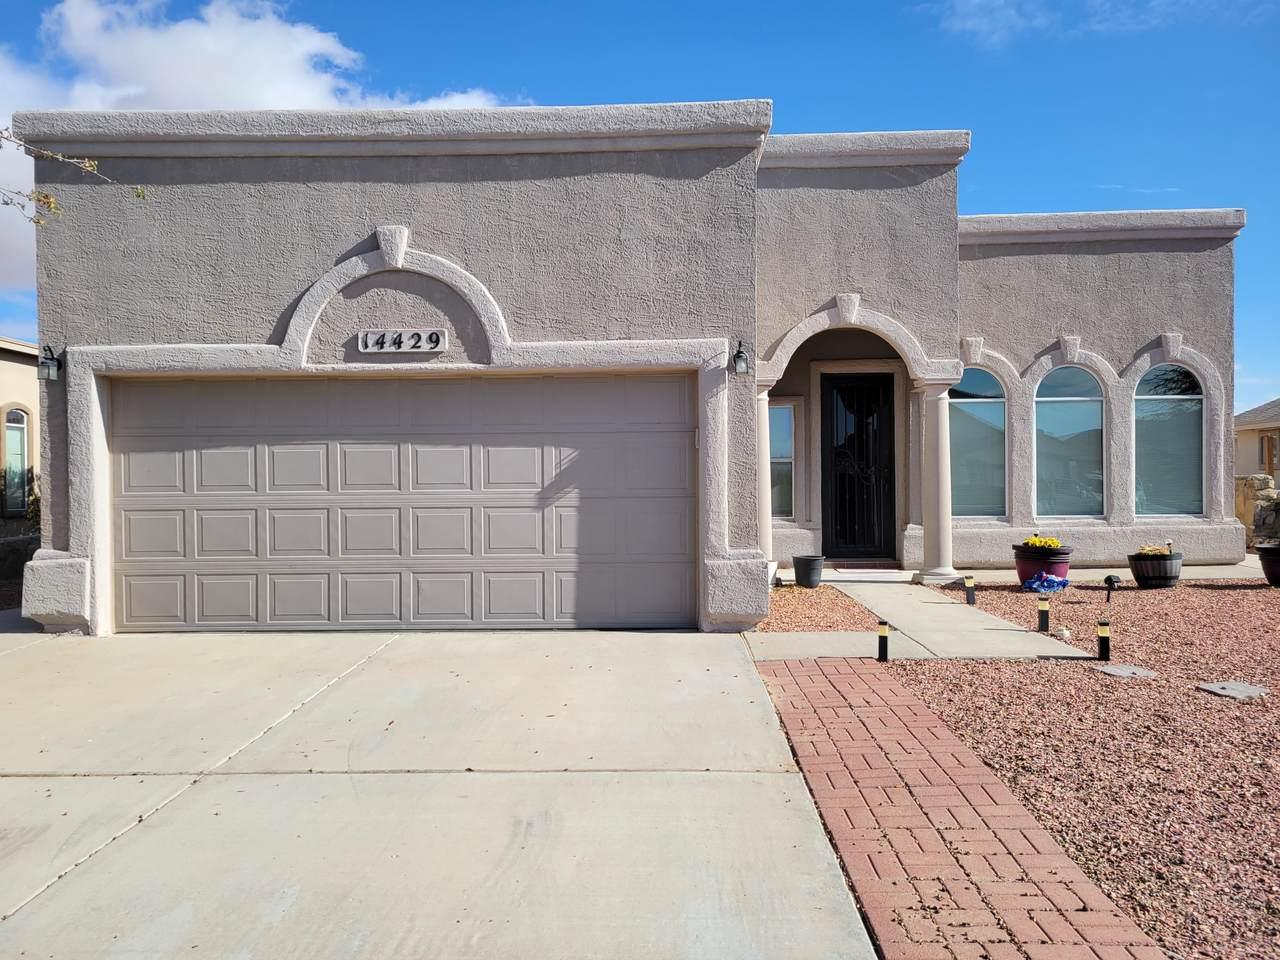 14429 Desert Sage Drive - Photo 1